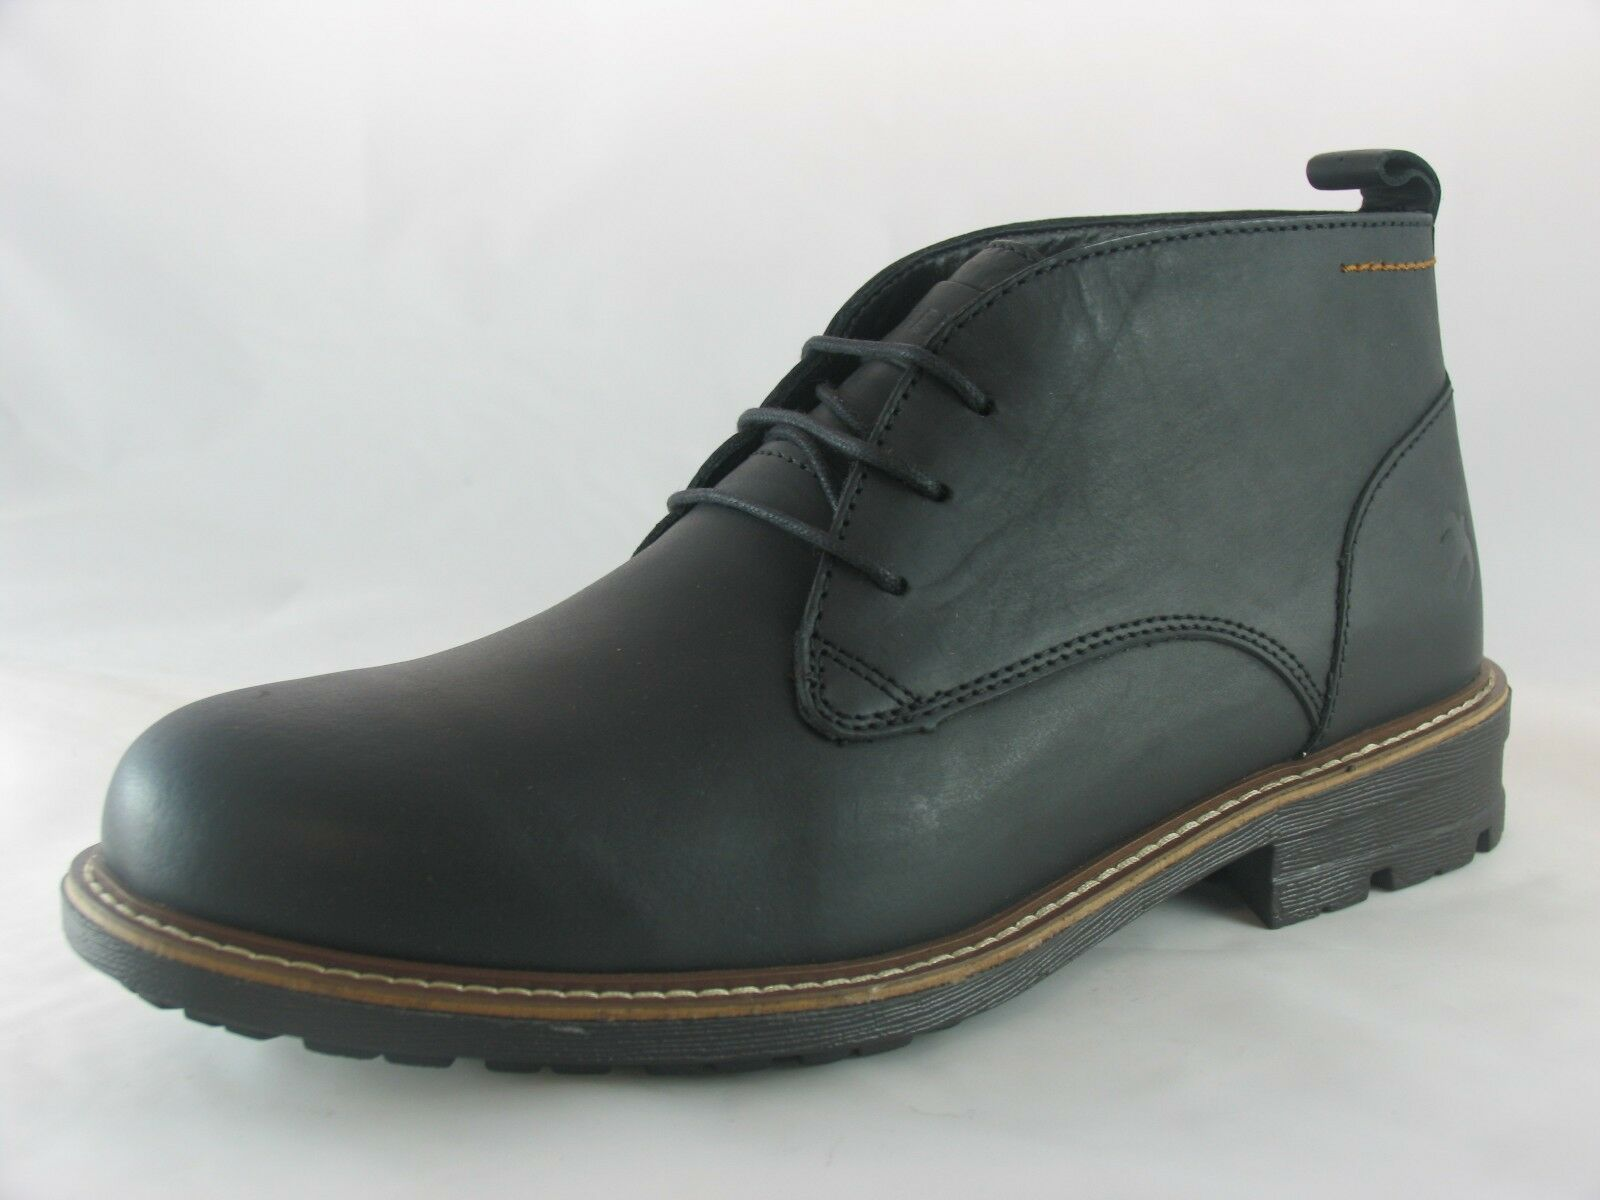 brakeburn bottines chucka botte les bottines brakeburn en cuir marron noir / 98211e